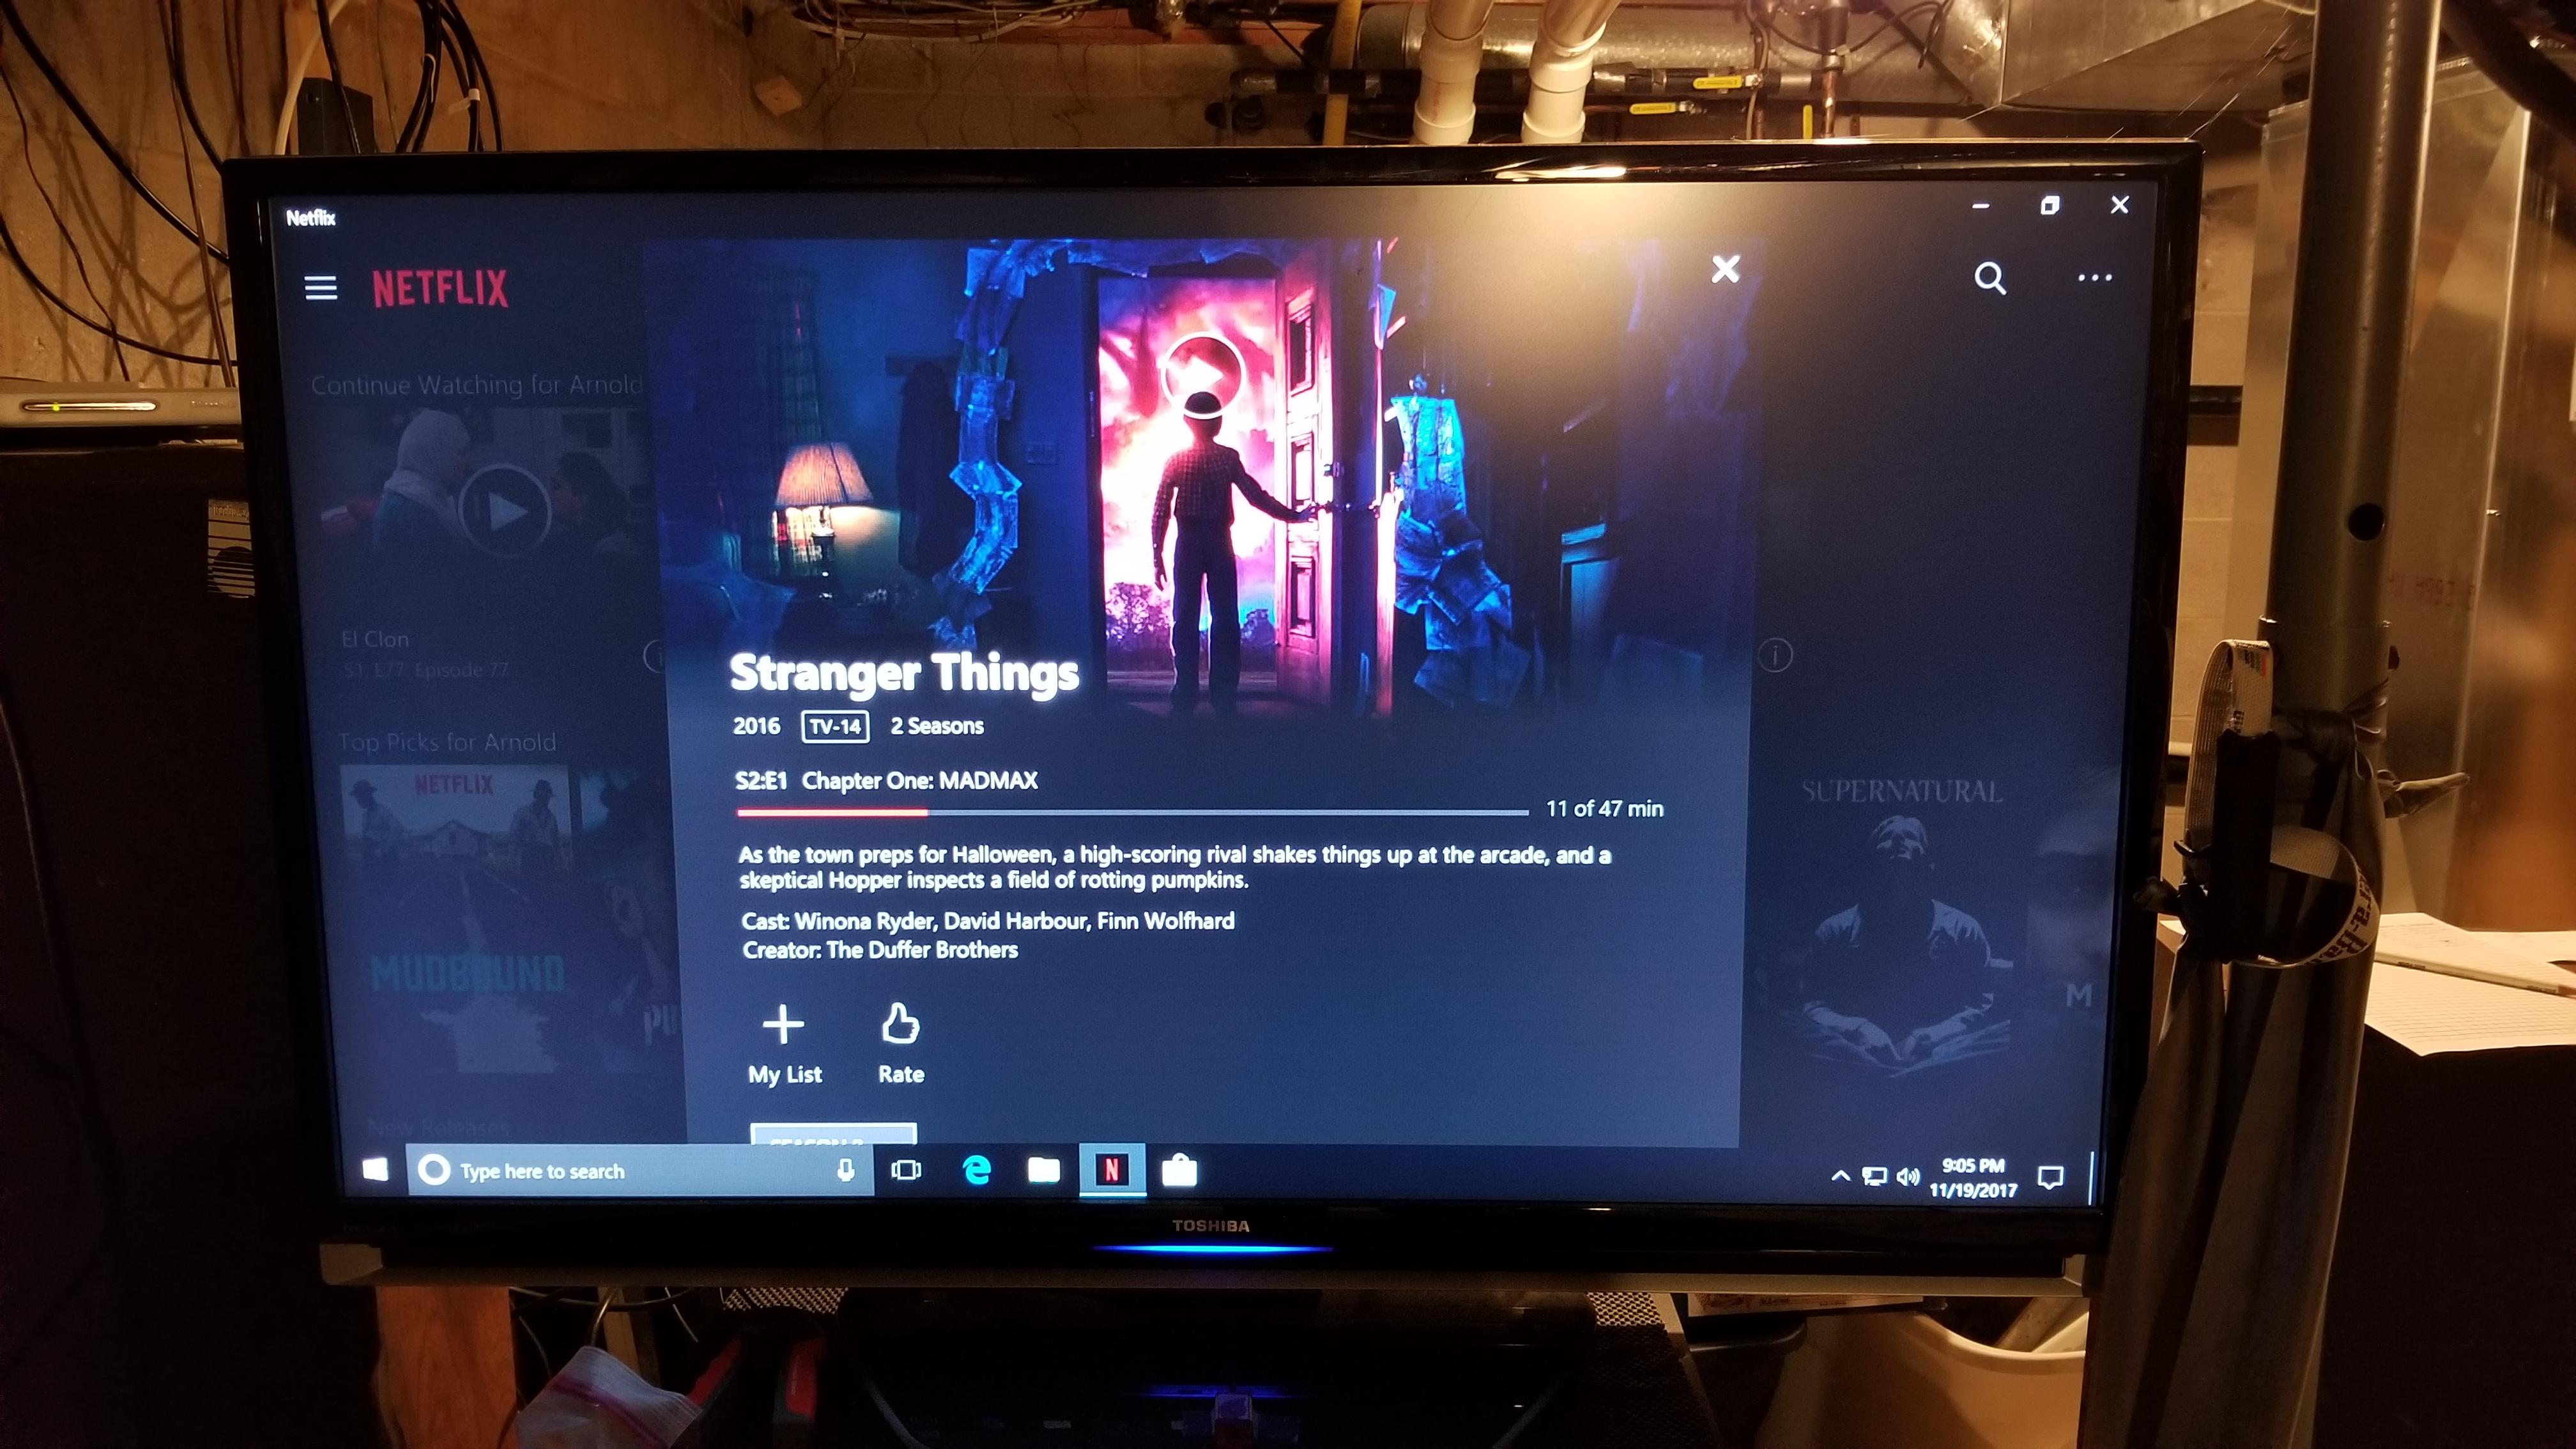 4K Netflix with an NVIDIA GTX 1050Ti 4GB Video Card - Arnold Solof